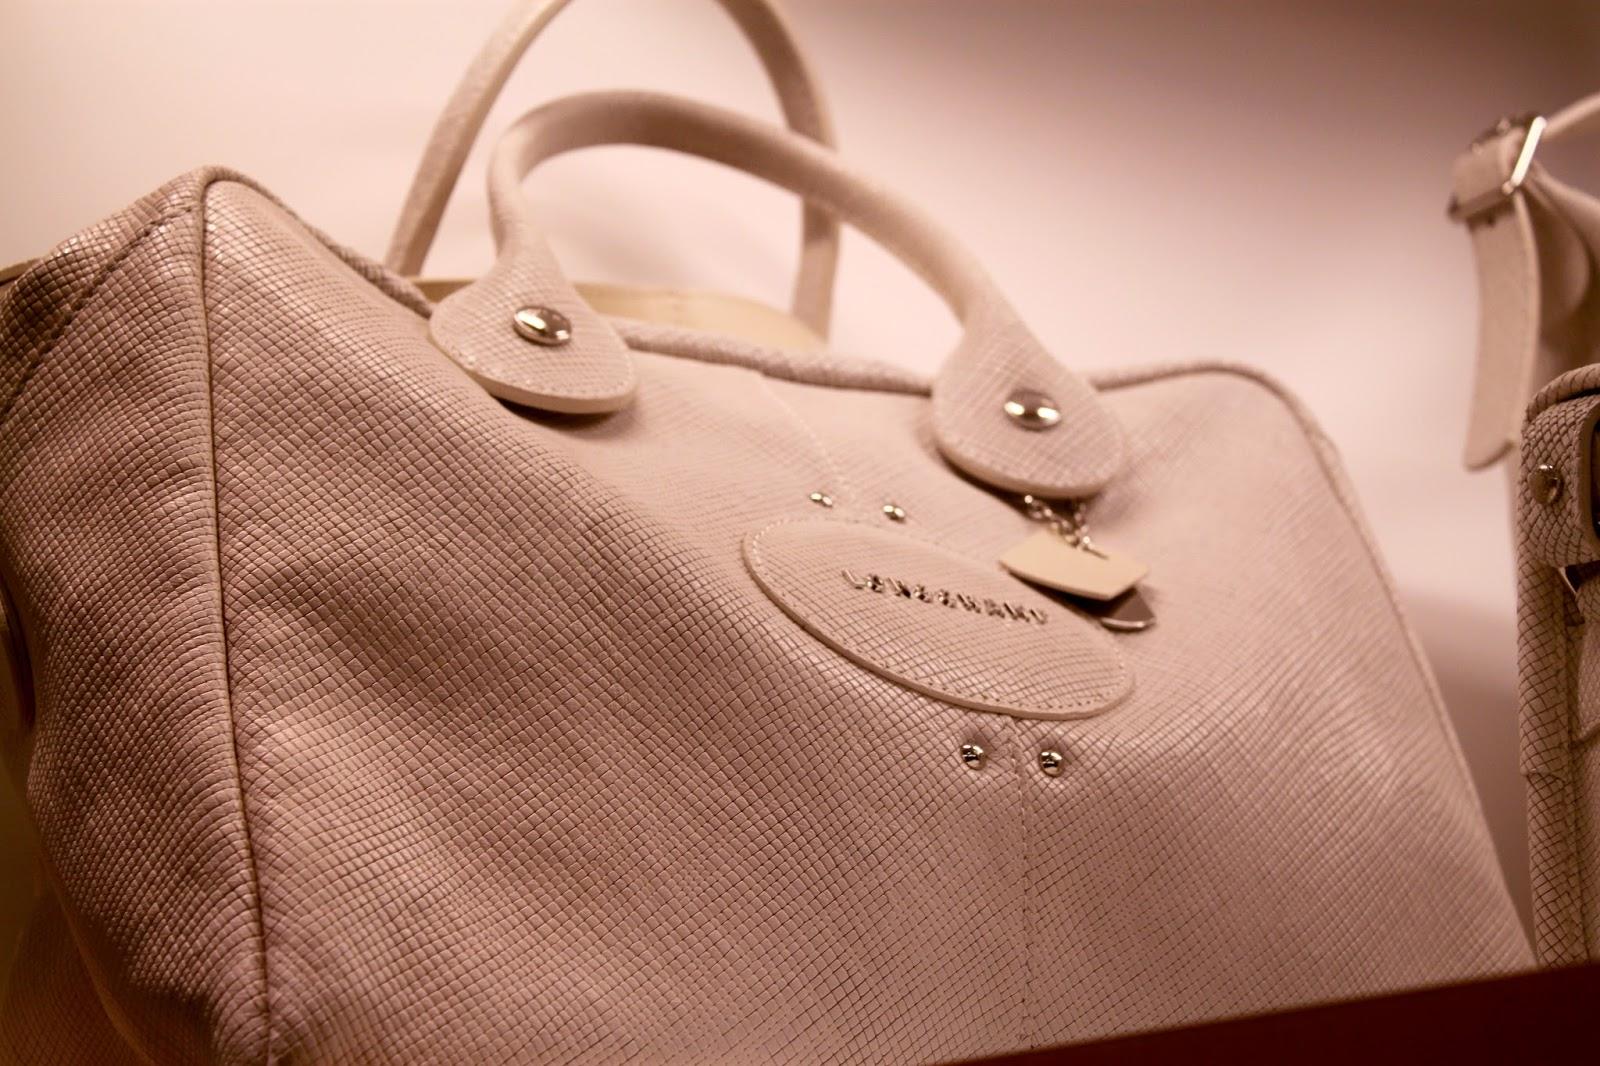 Style Kush Longchamp Bigger Than Life Quadry Bag The Amazing Quadri Tote